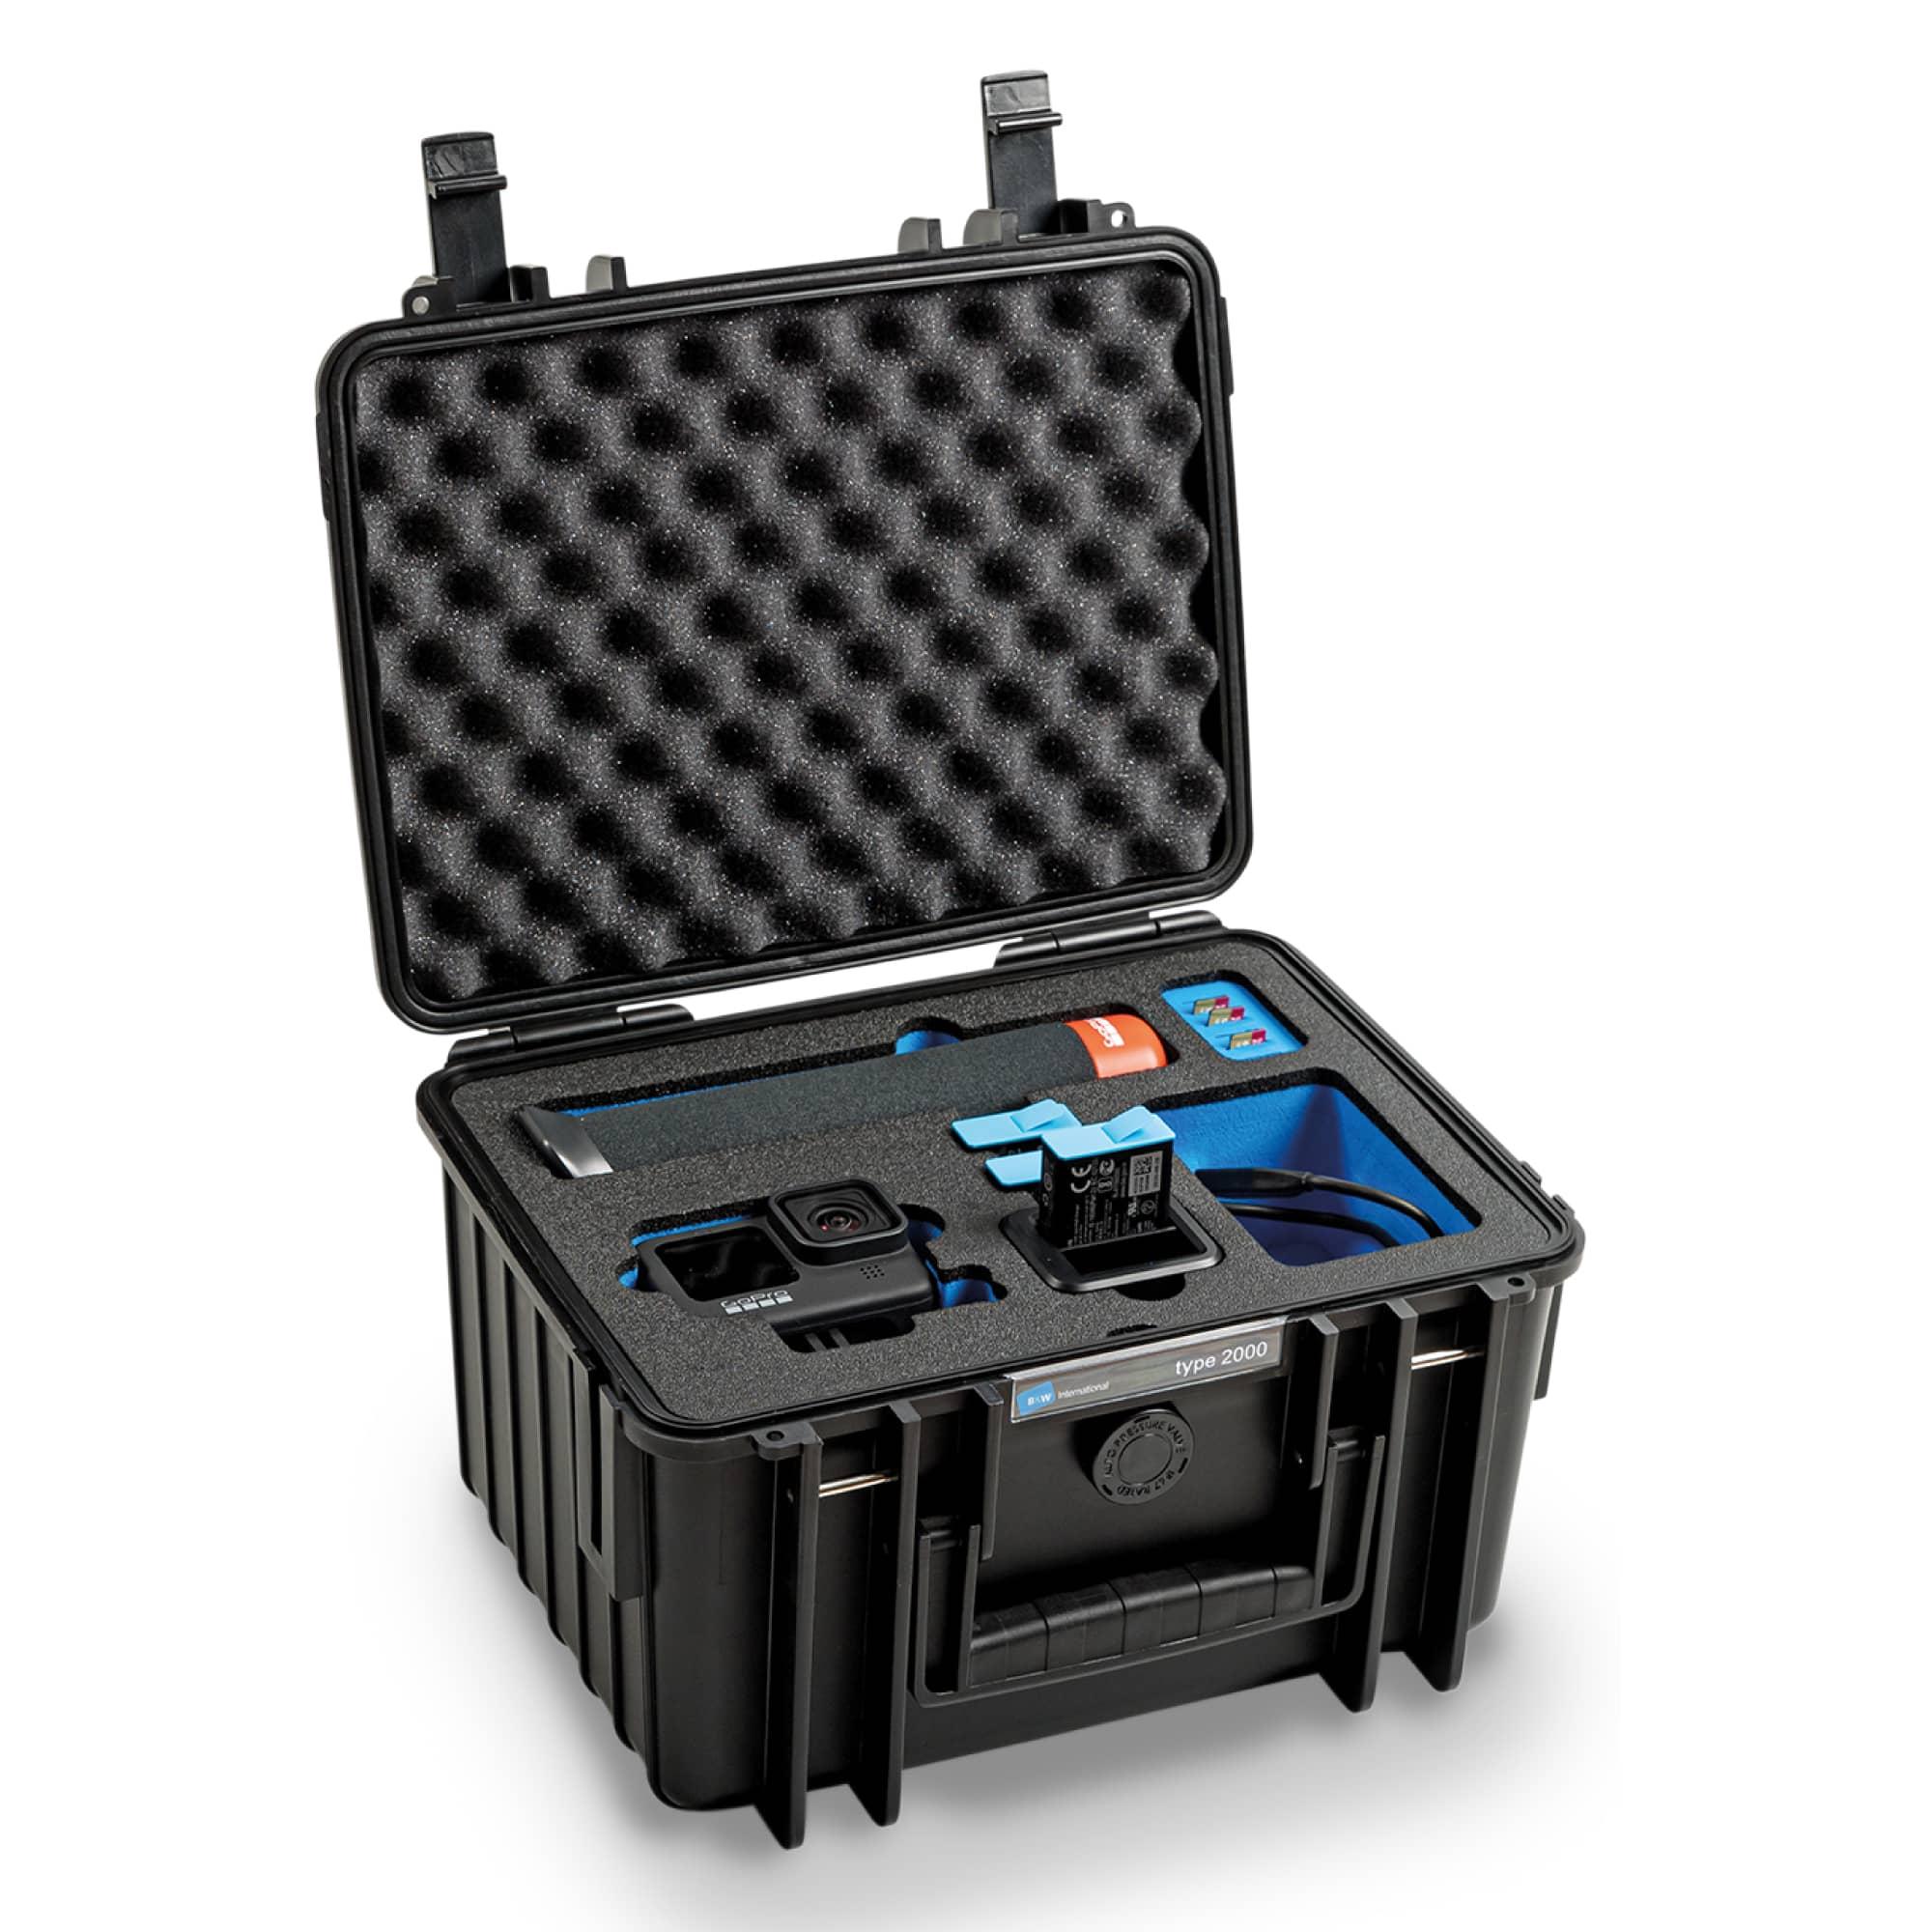 GoPro Hero 9/10 Outdoor Case Typ 4000 from B&W